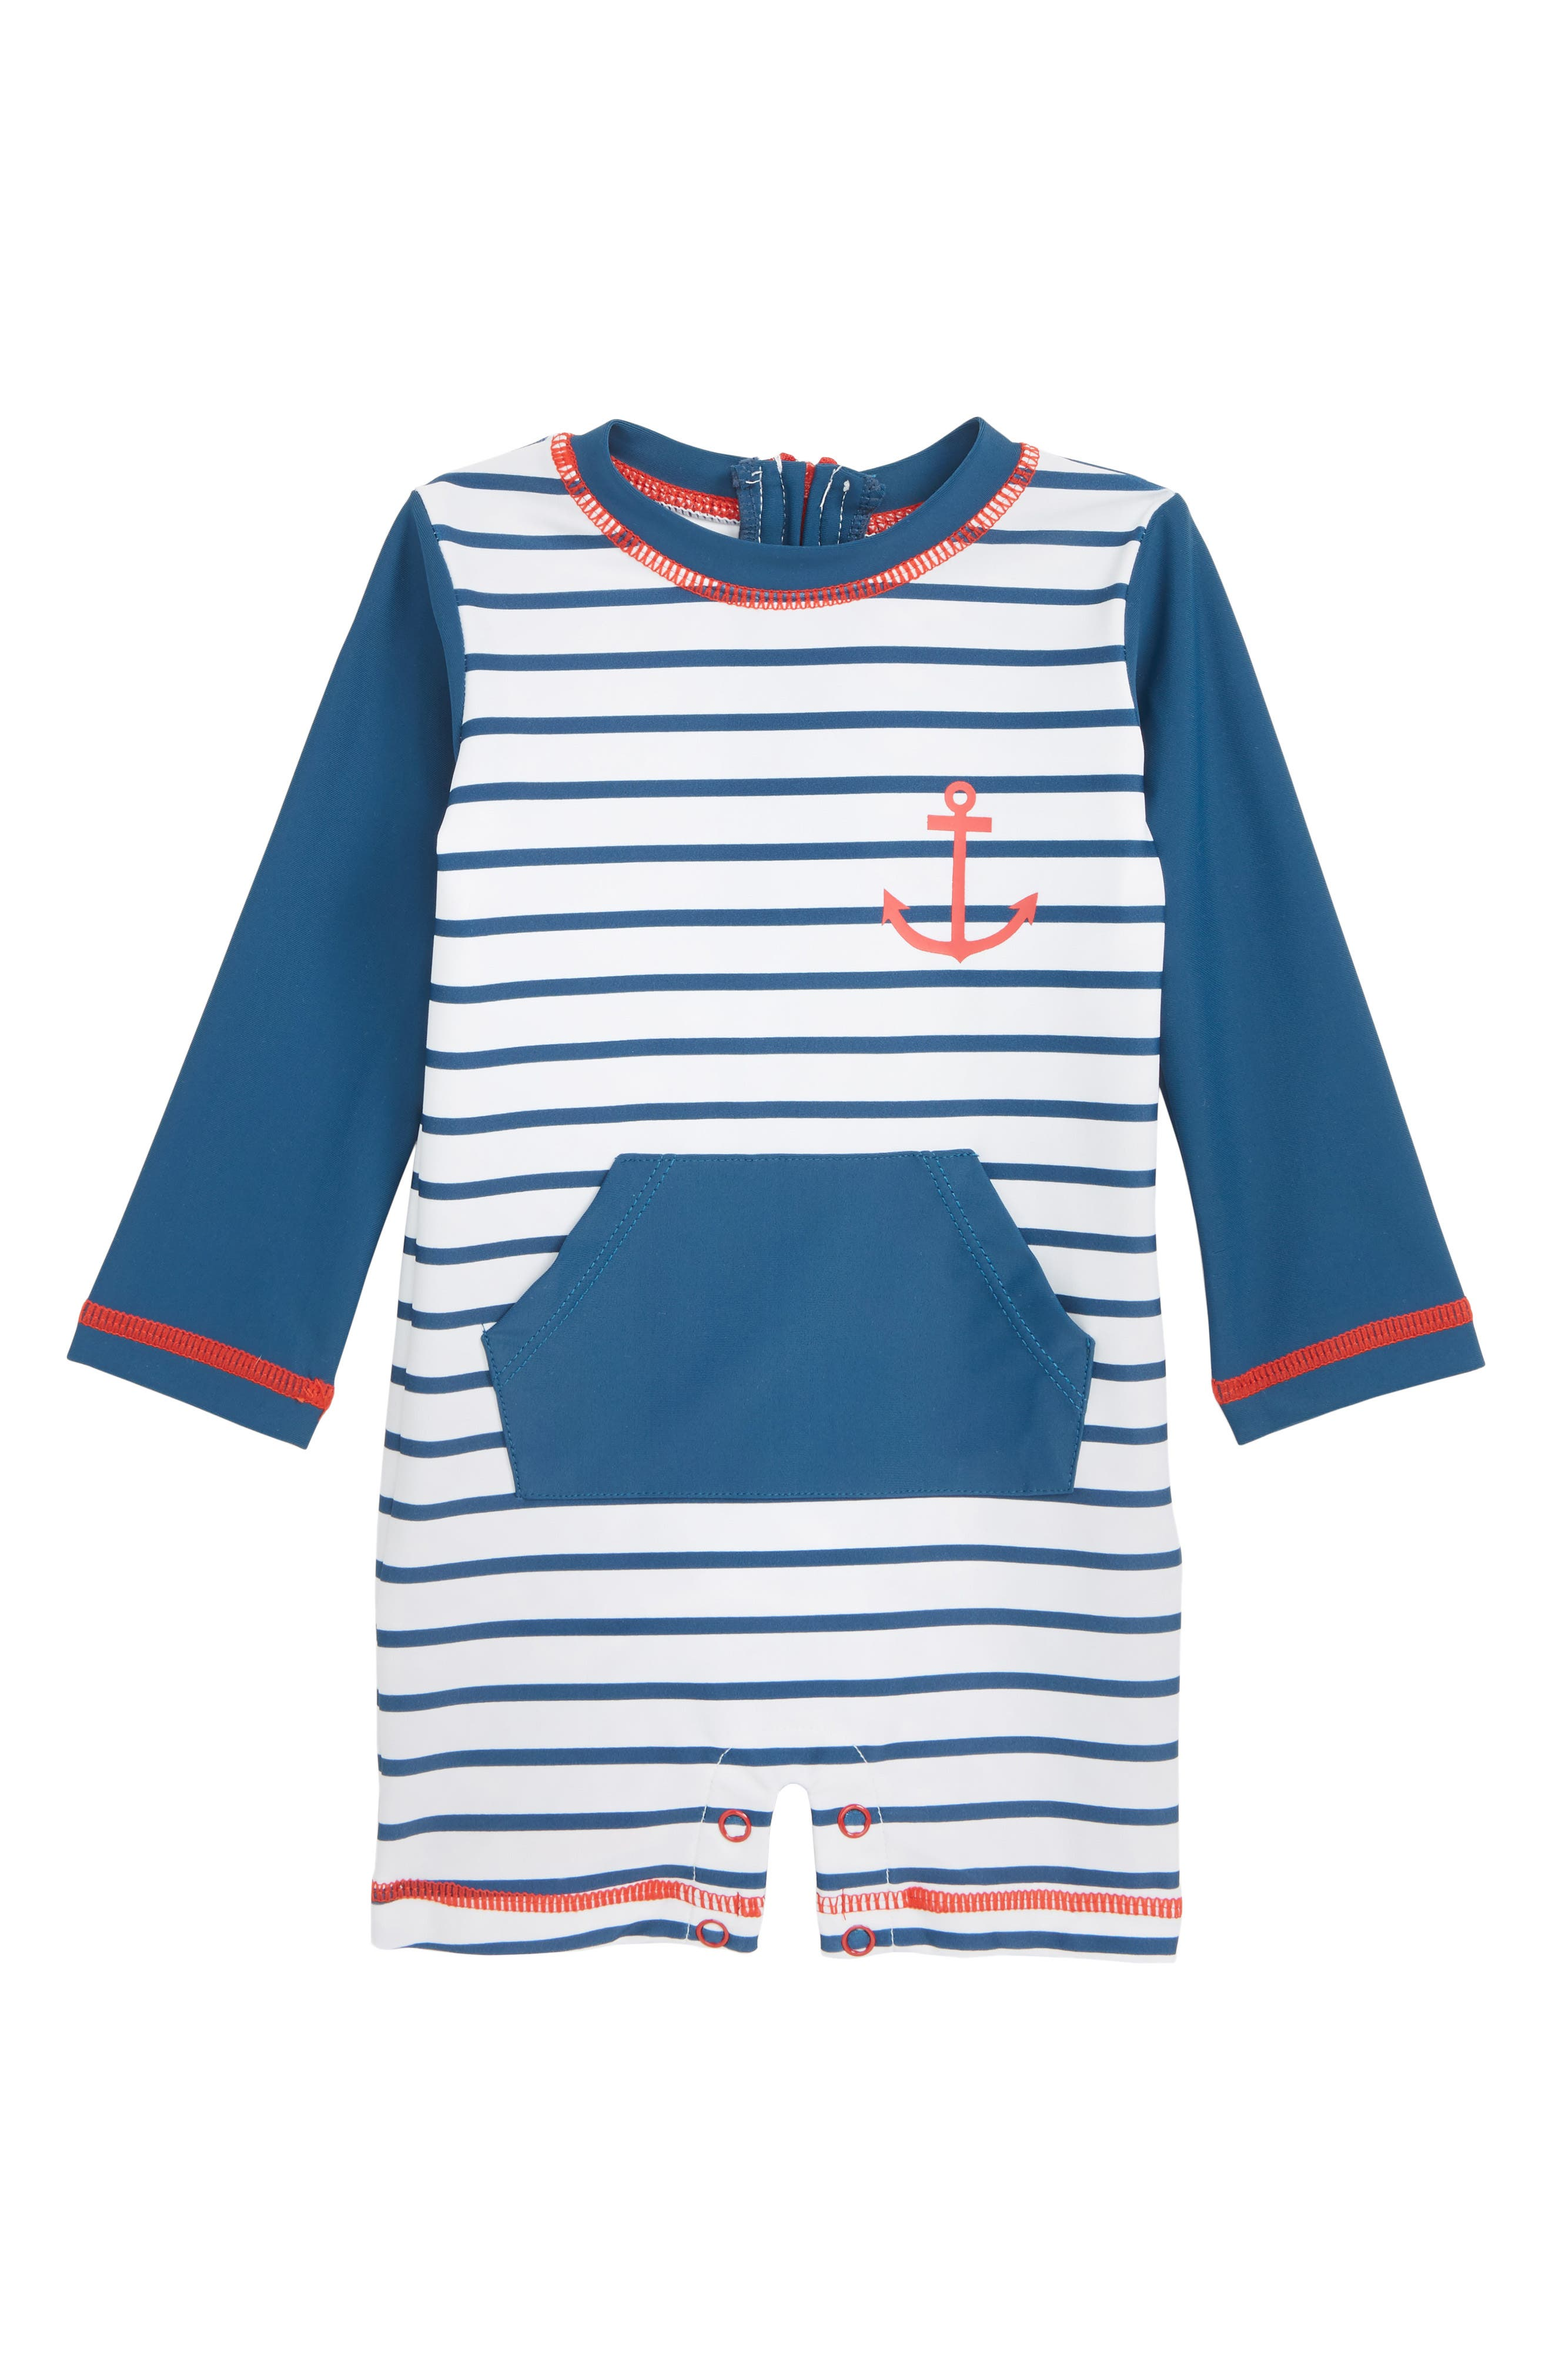 HATLEY Nautical Stripes One-Piece Rashguard Swimsuit, Main, color, 100